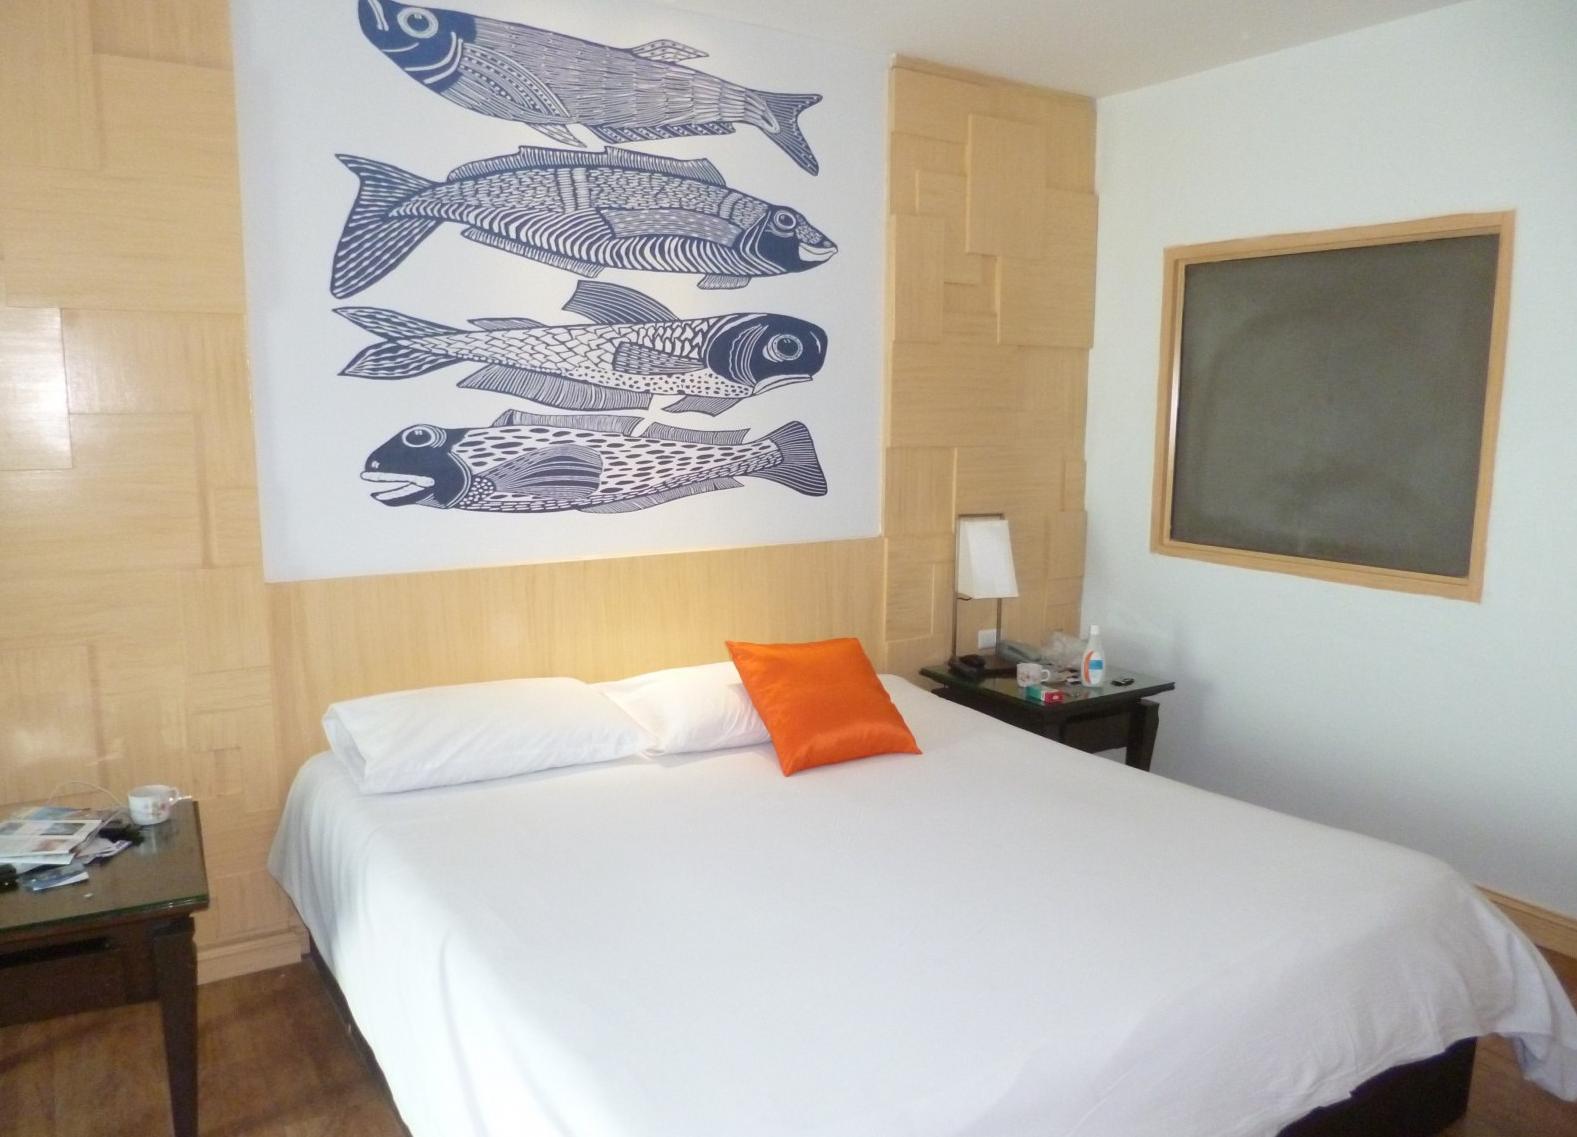 Отзыв об отеле Sea Breeze Jomtien Report 3 отзыв туриста